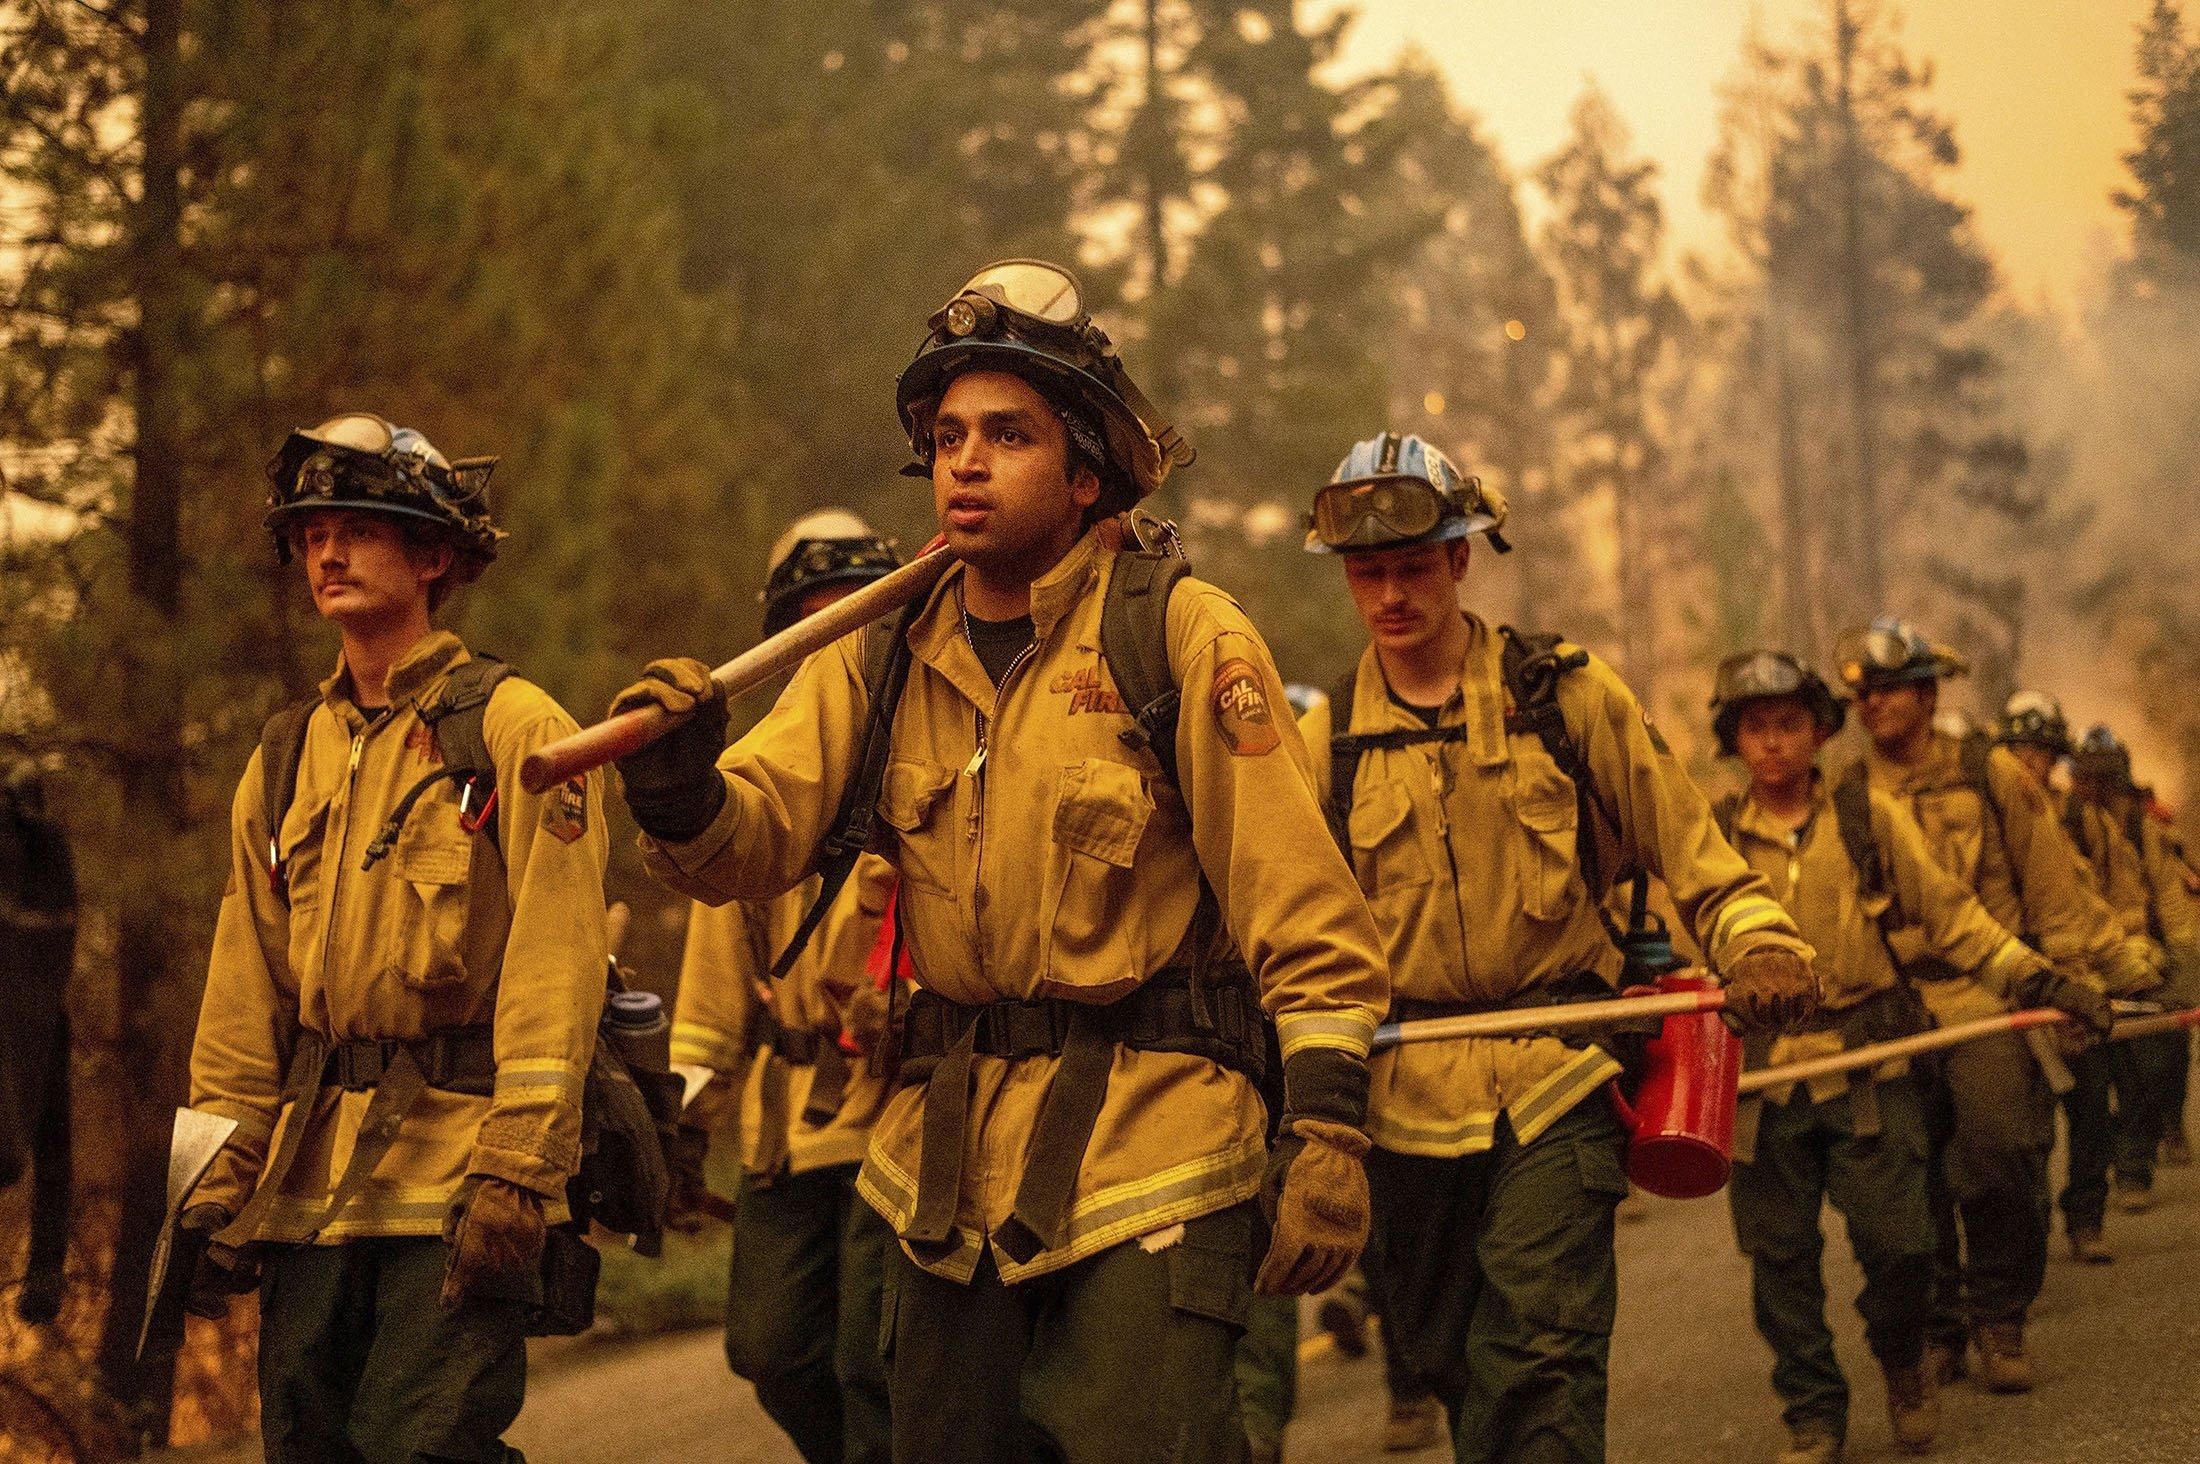 Cal Fire firefighters battle the Dixie Fire near Prattville in Plumas County, California, U.S., July 23, 2021. (AP Photo)